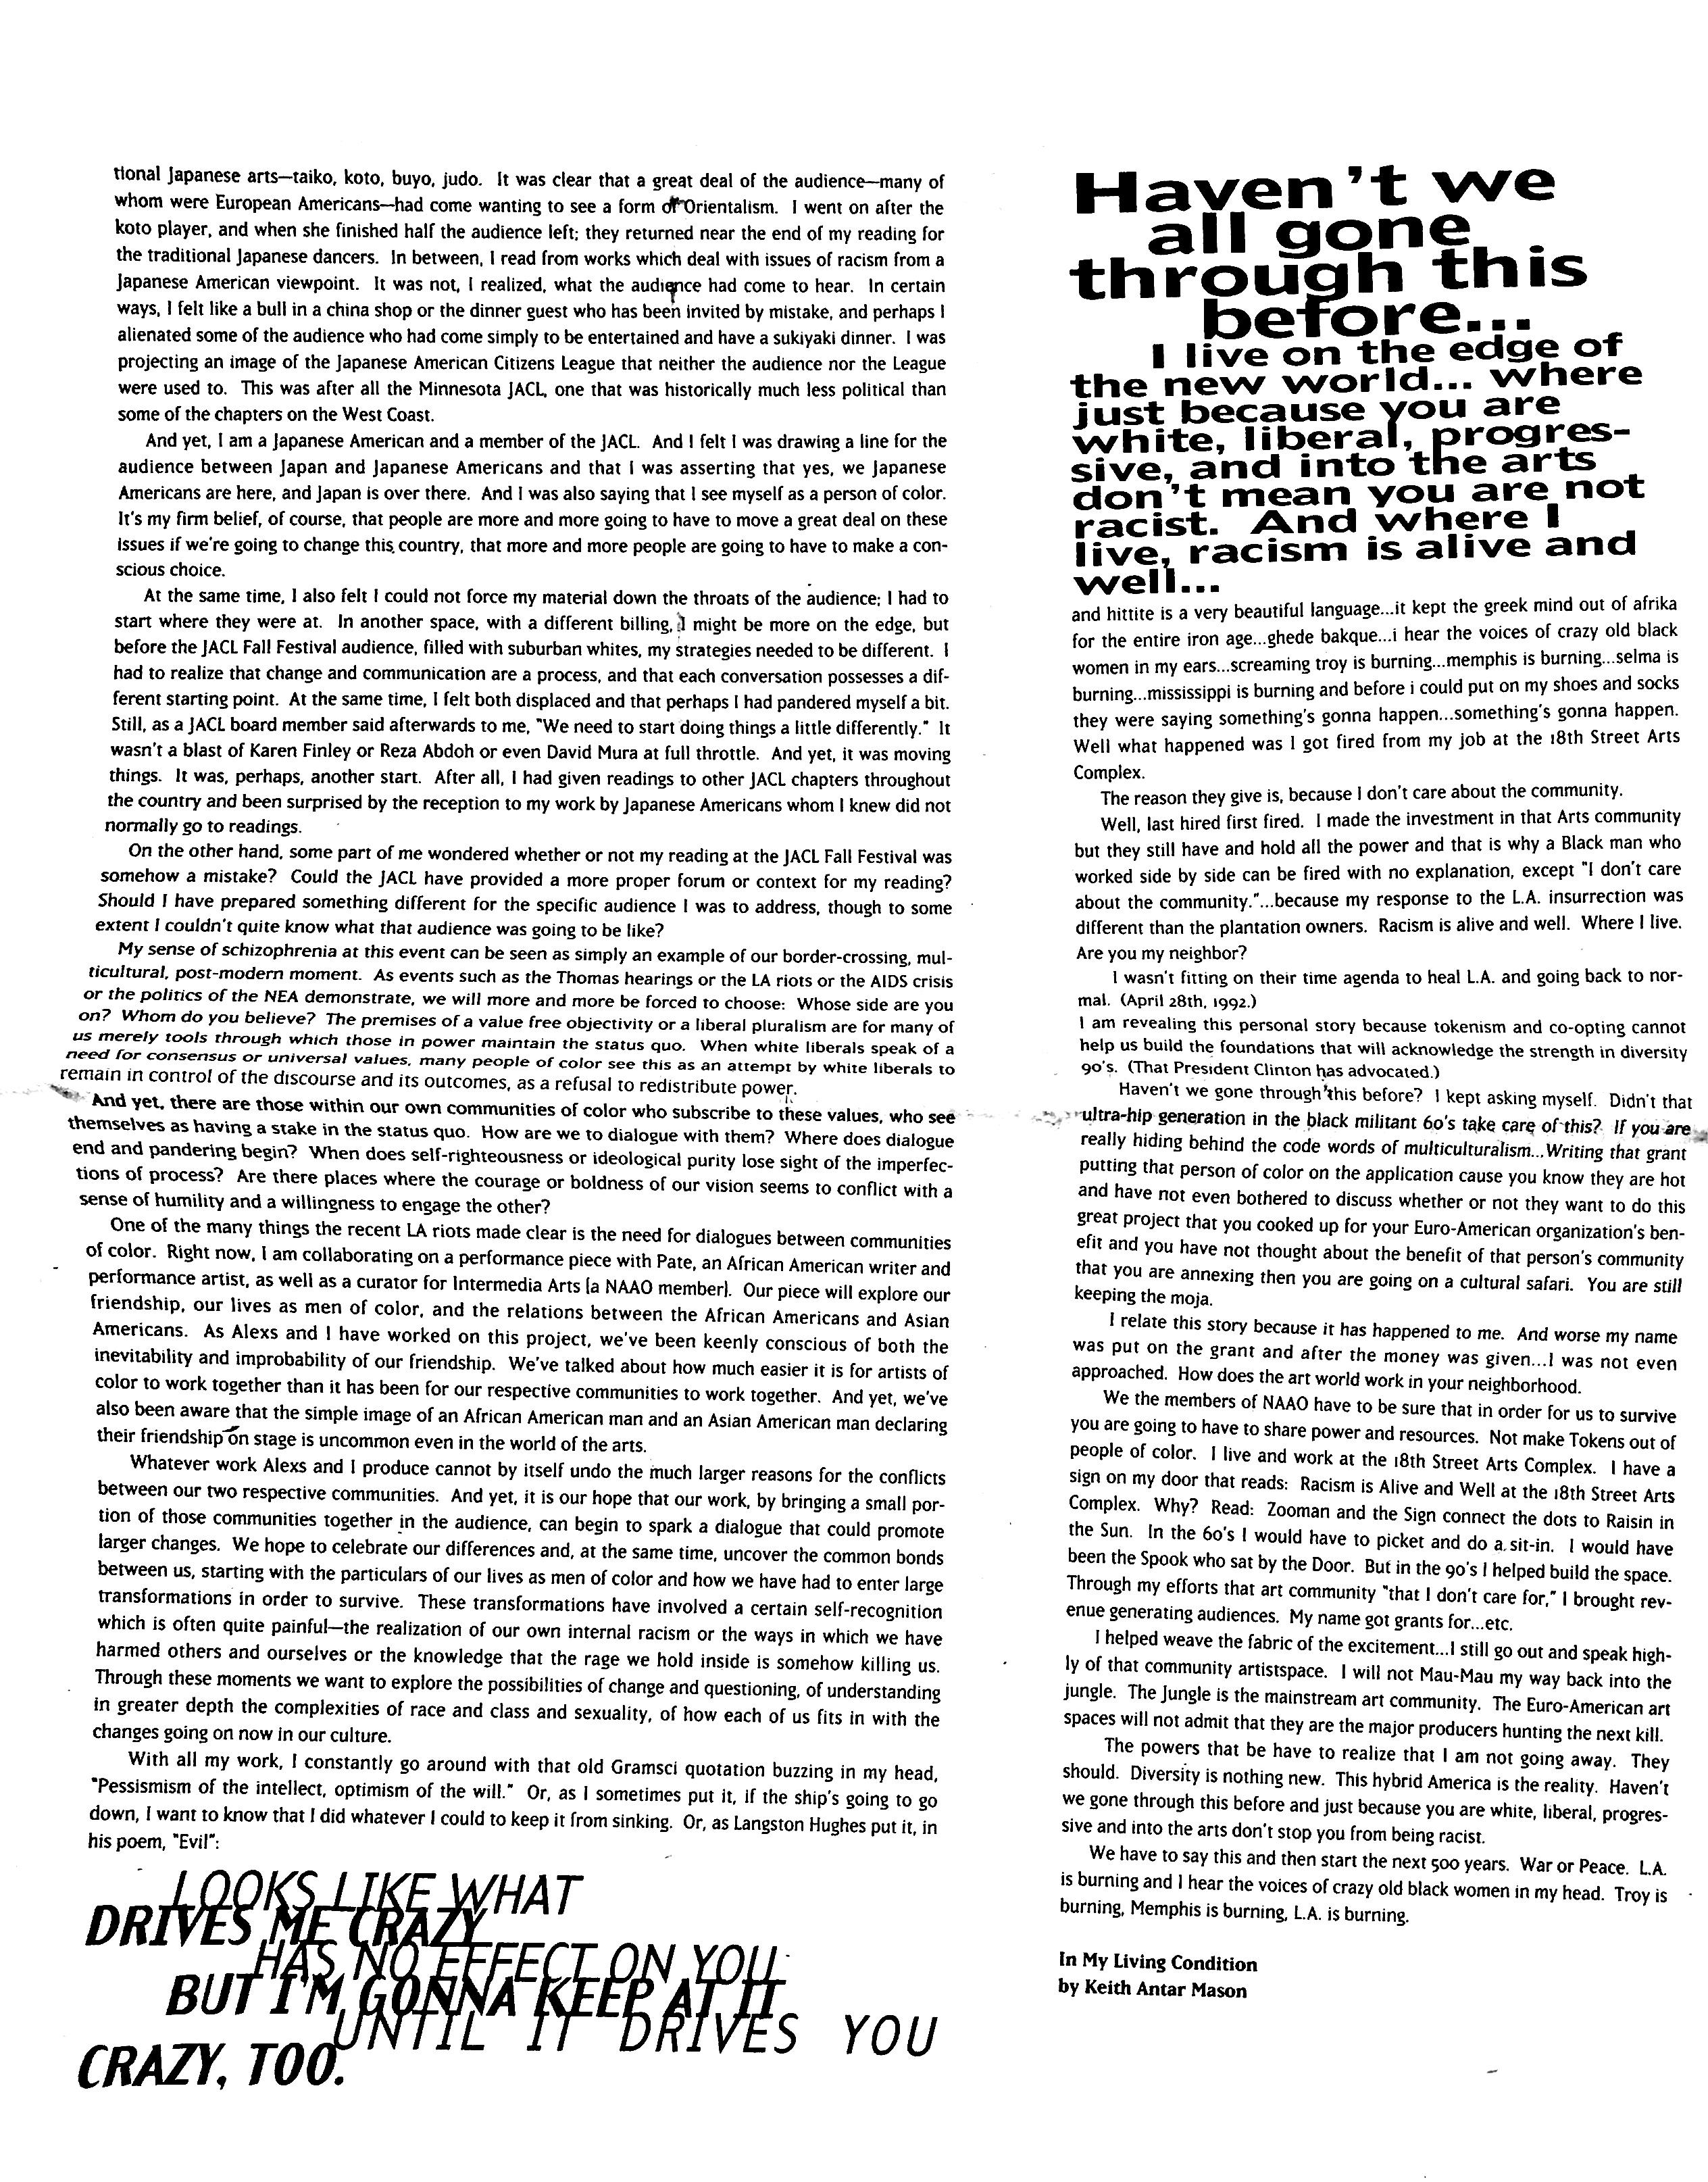 April 1993 - NAAO Bulletin Page 36.jpg